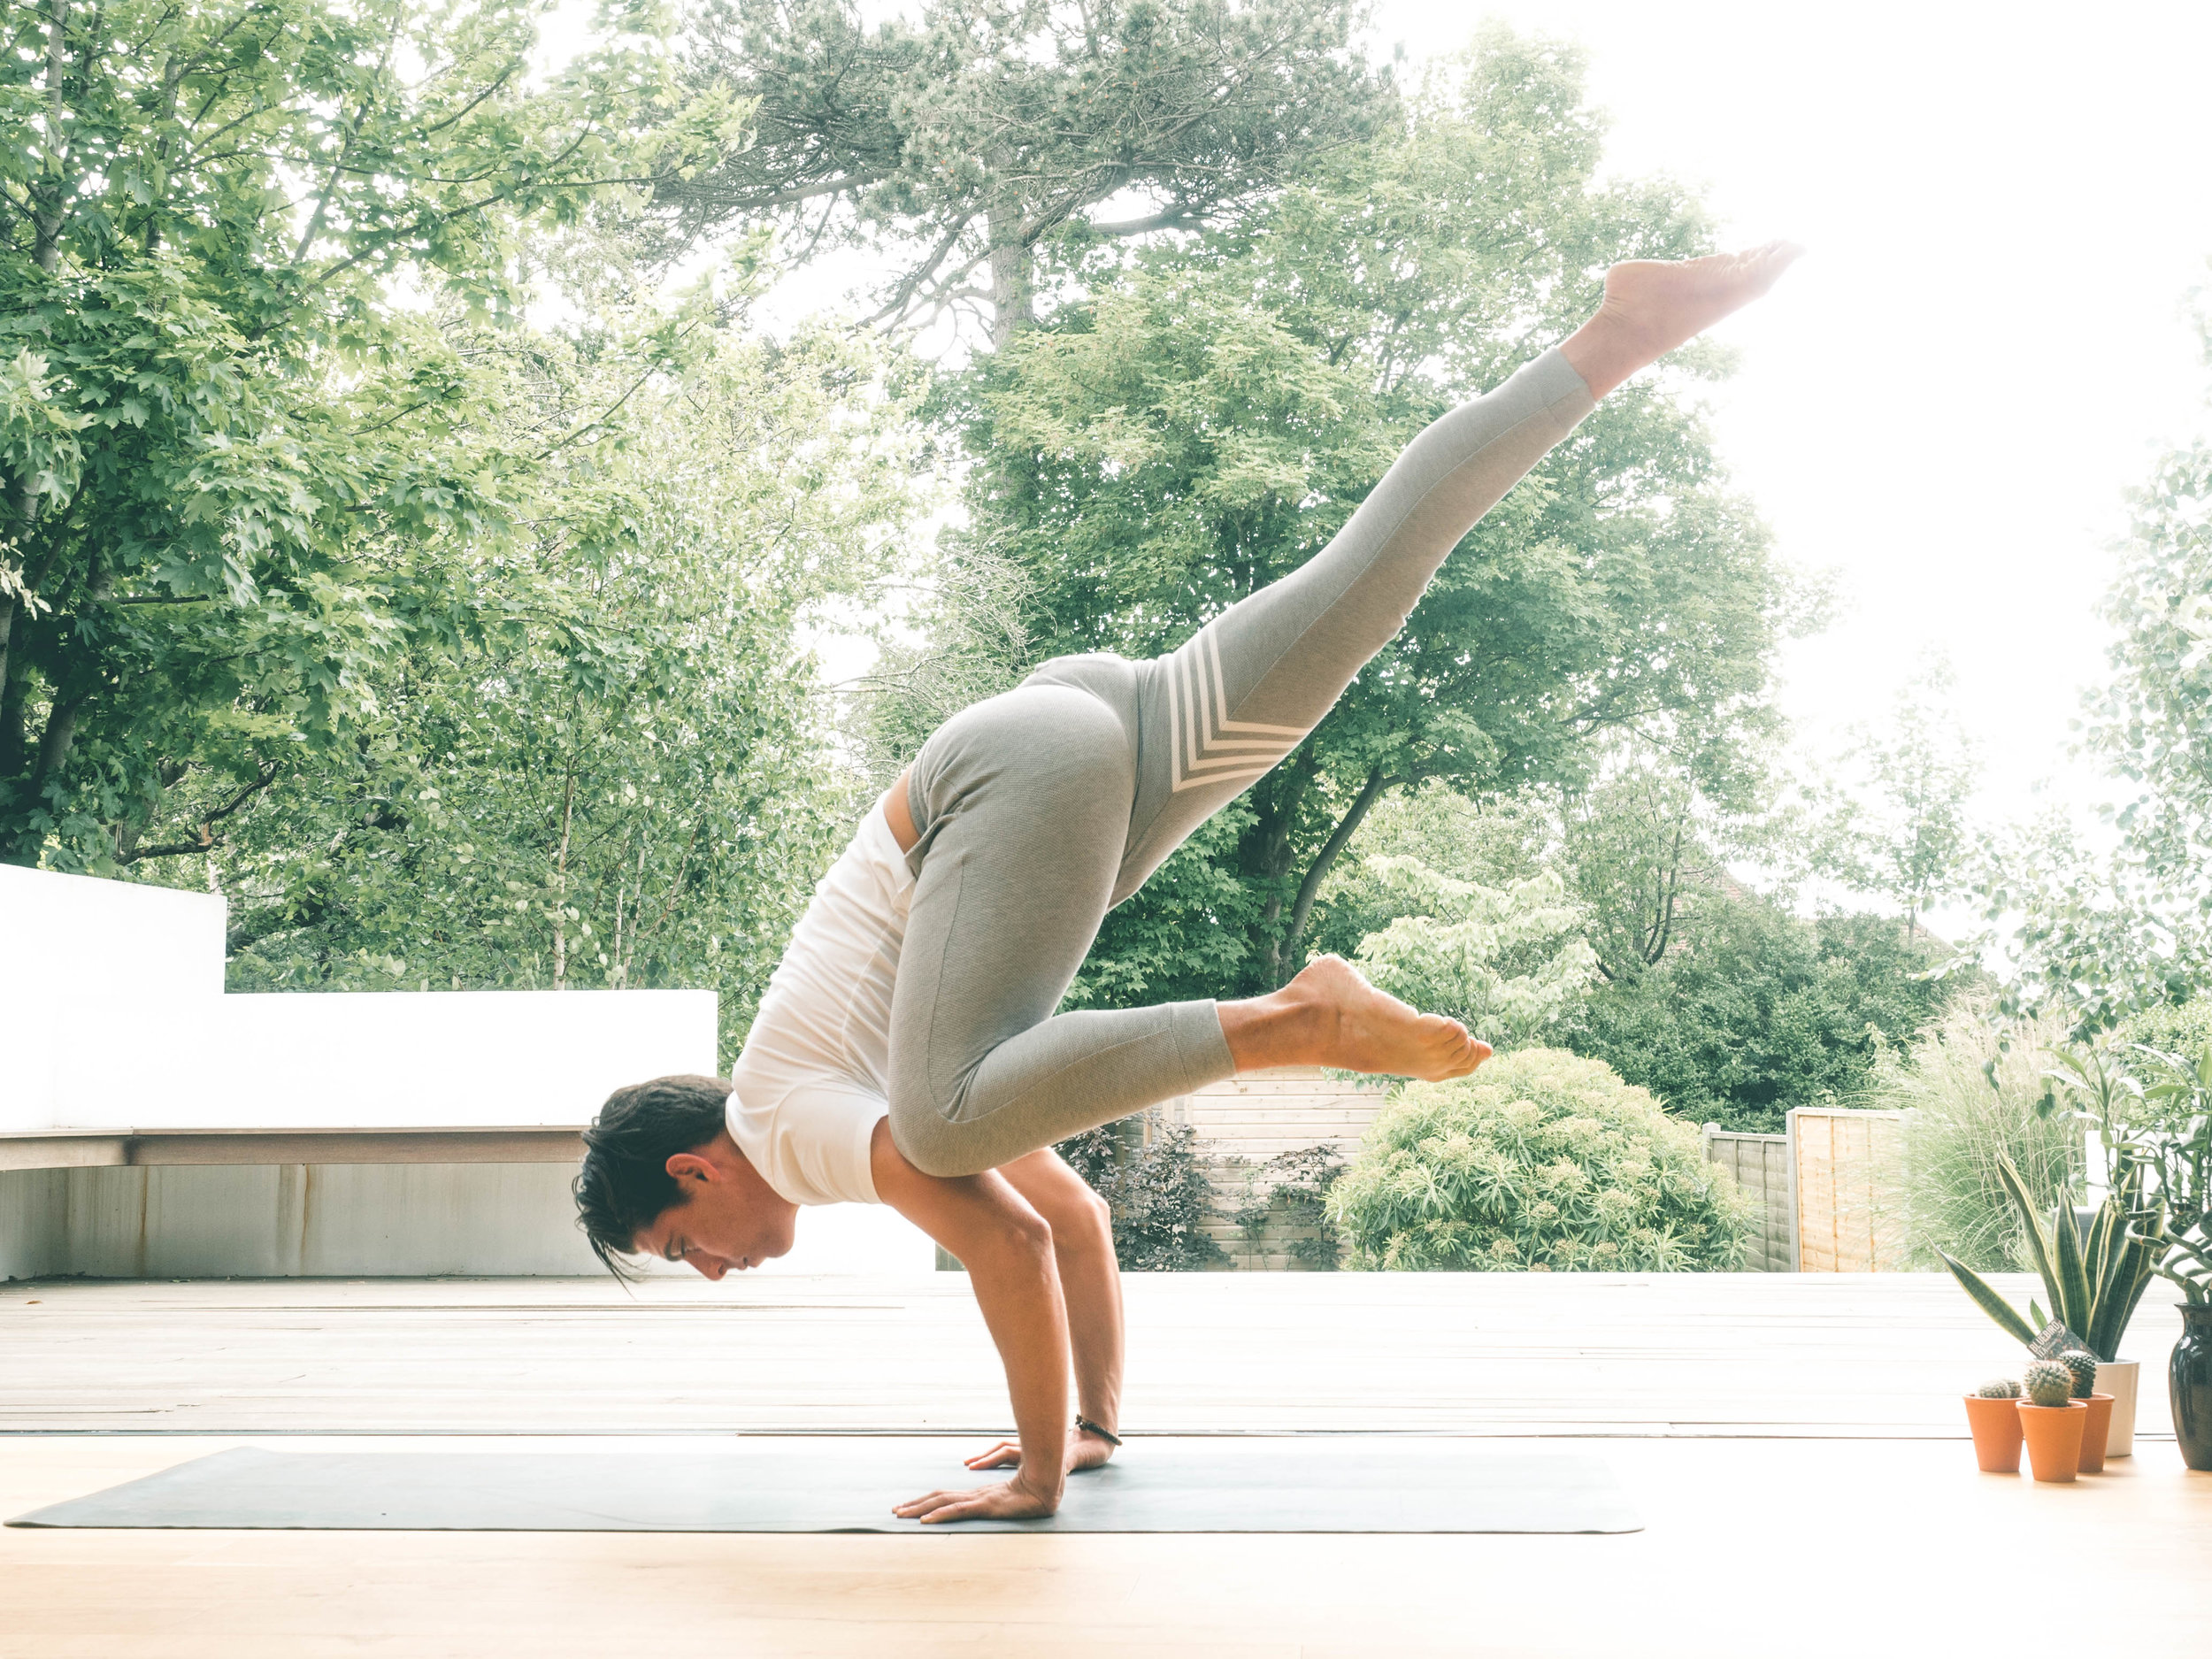 Brad yoga